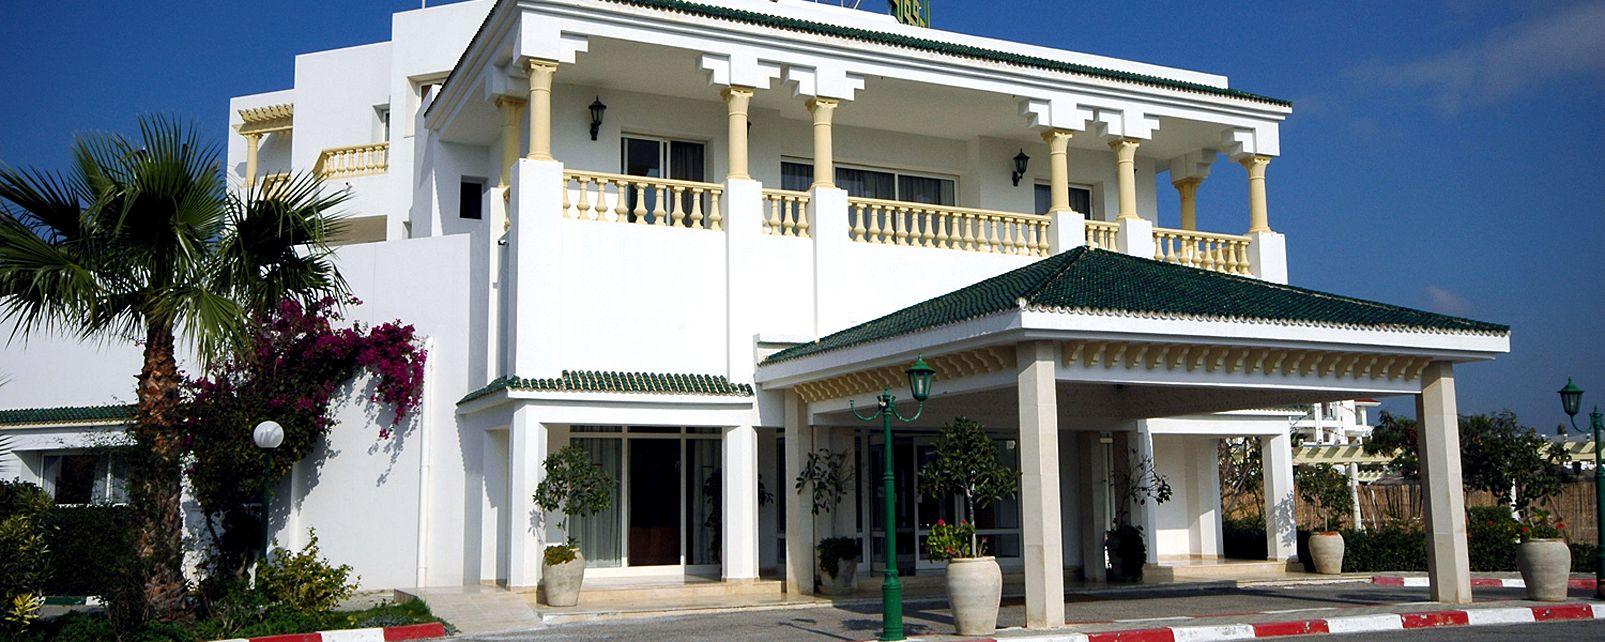 Hôtel Medi Golf